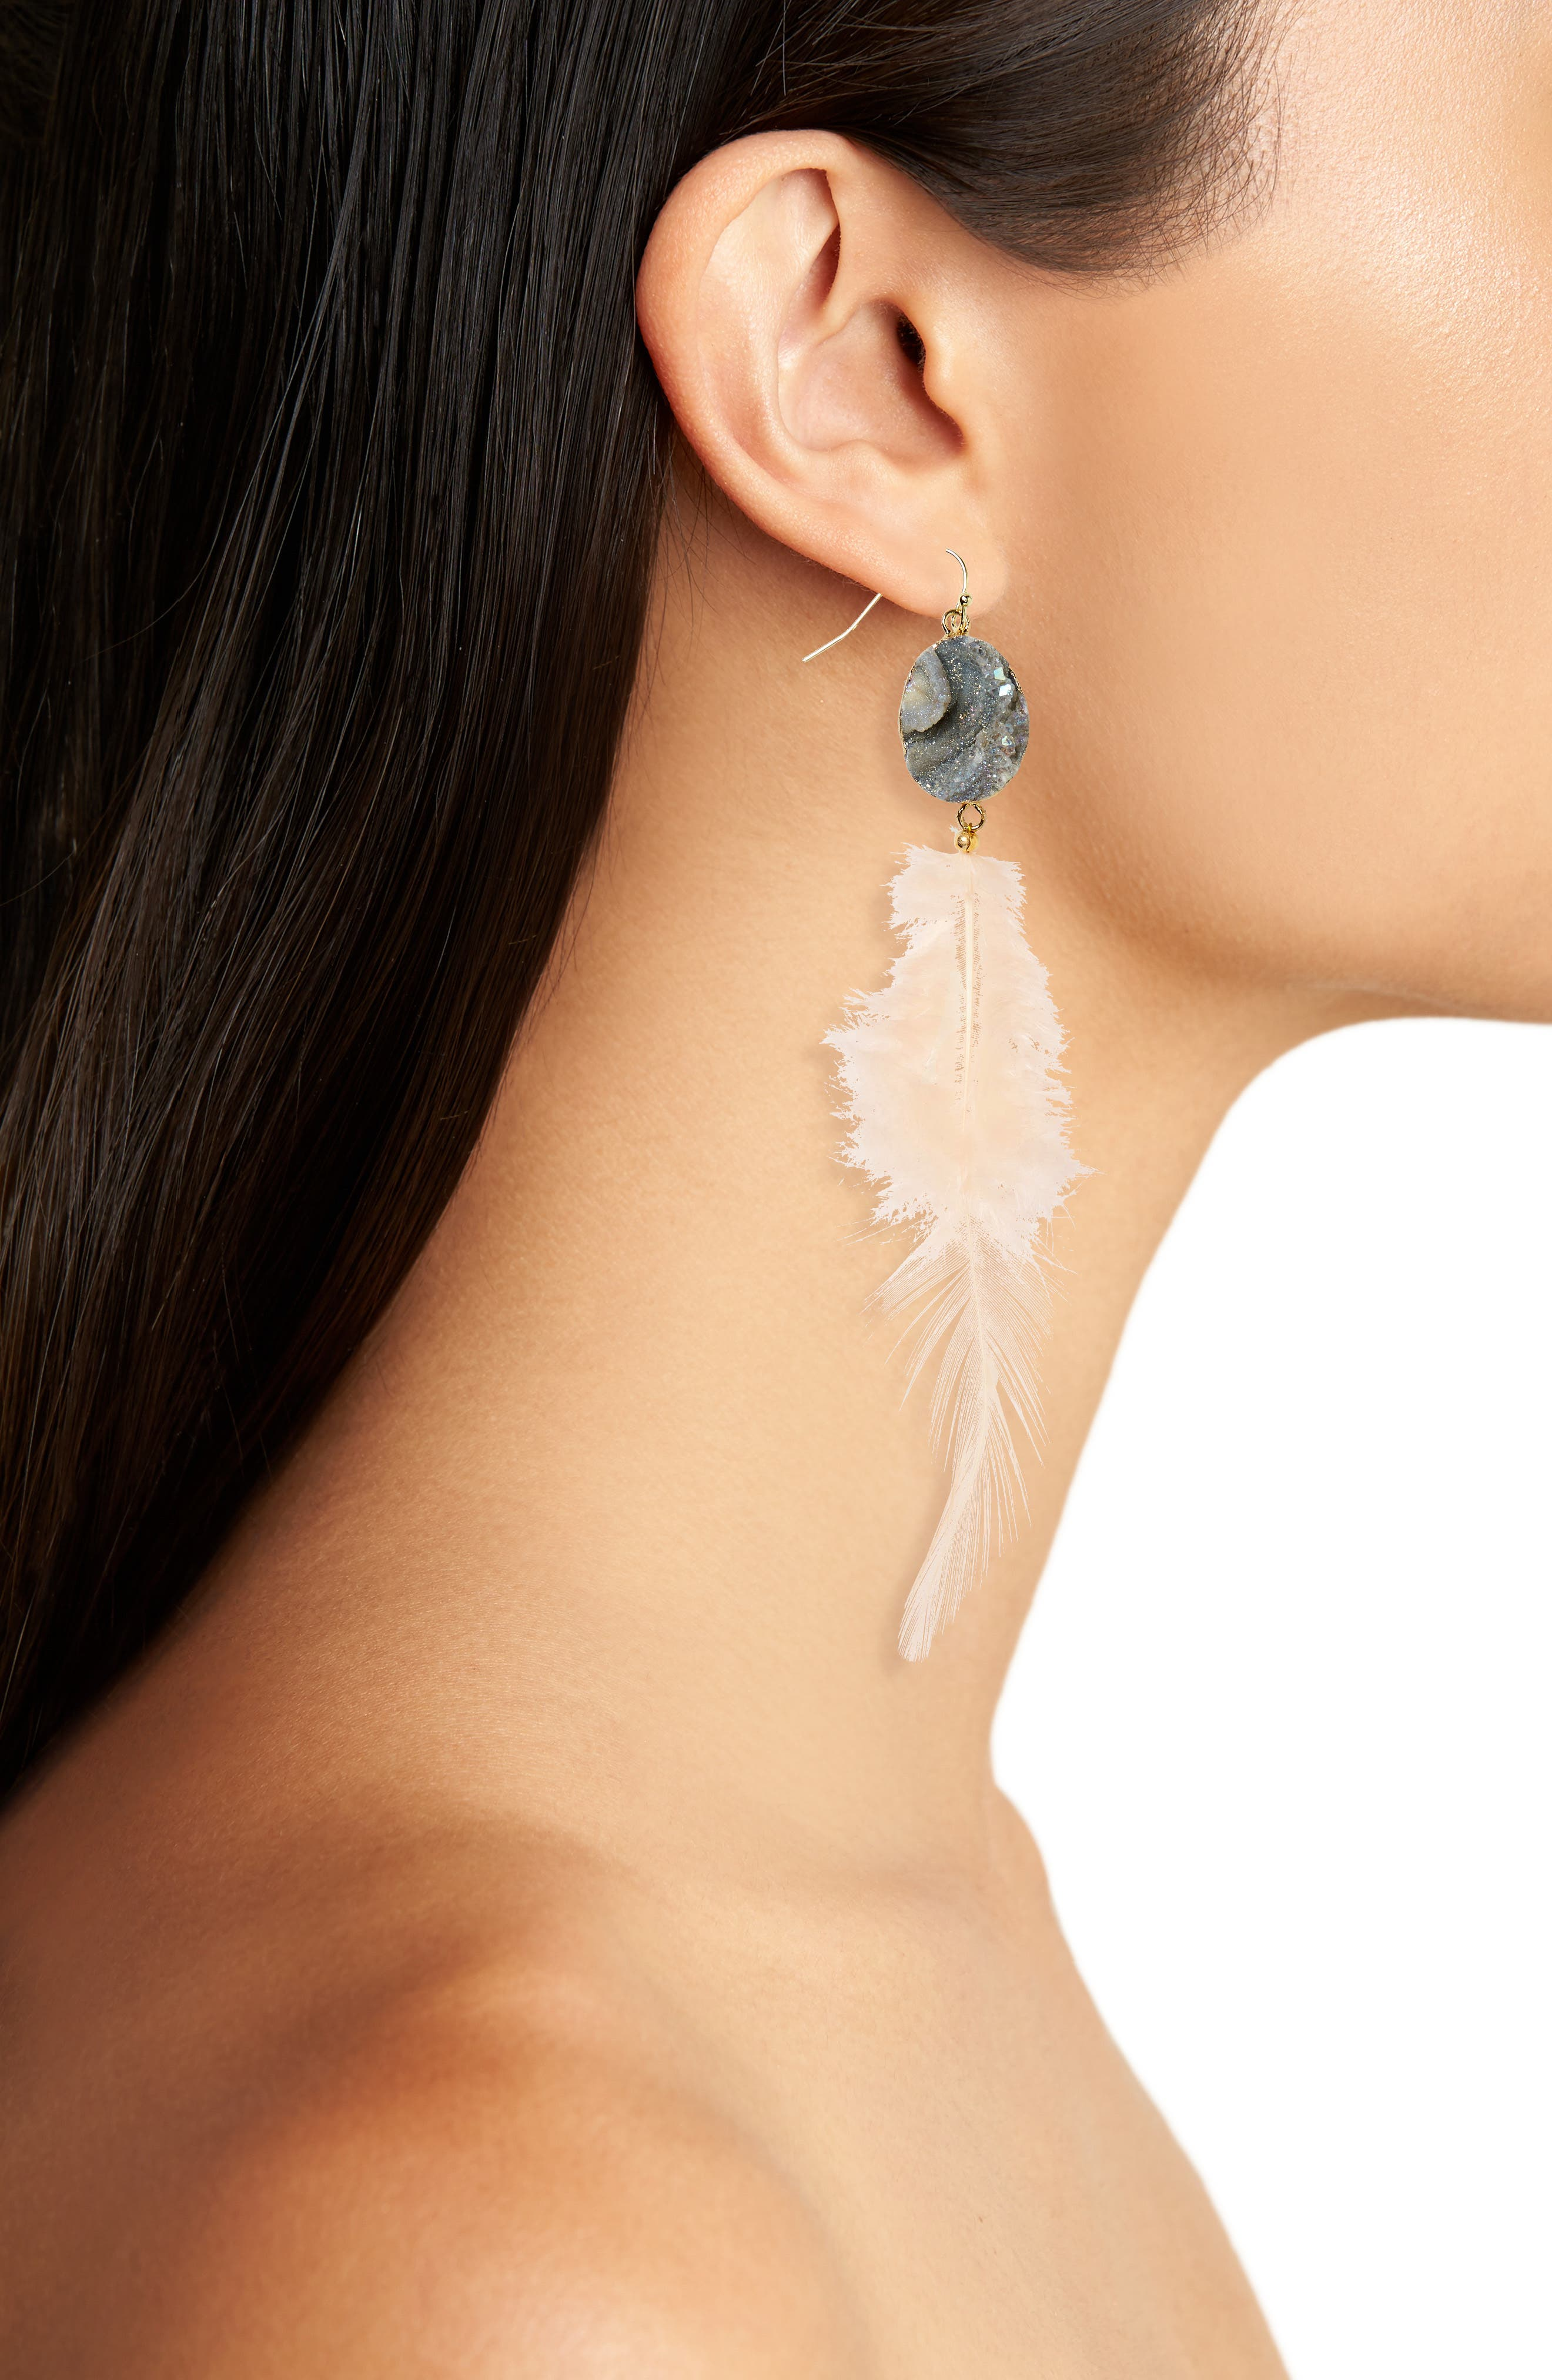 Sunstone Feather Earrings,                             Alternate thumbnail 2, color,                             White